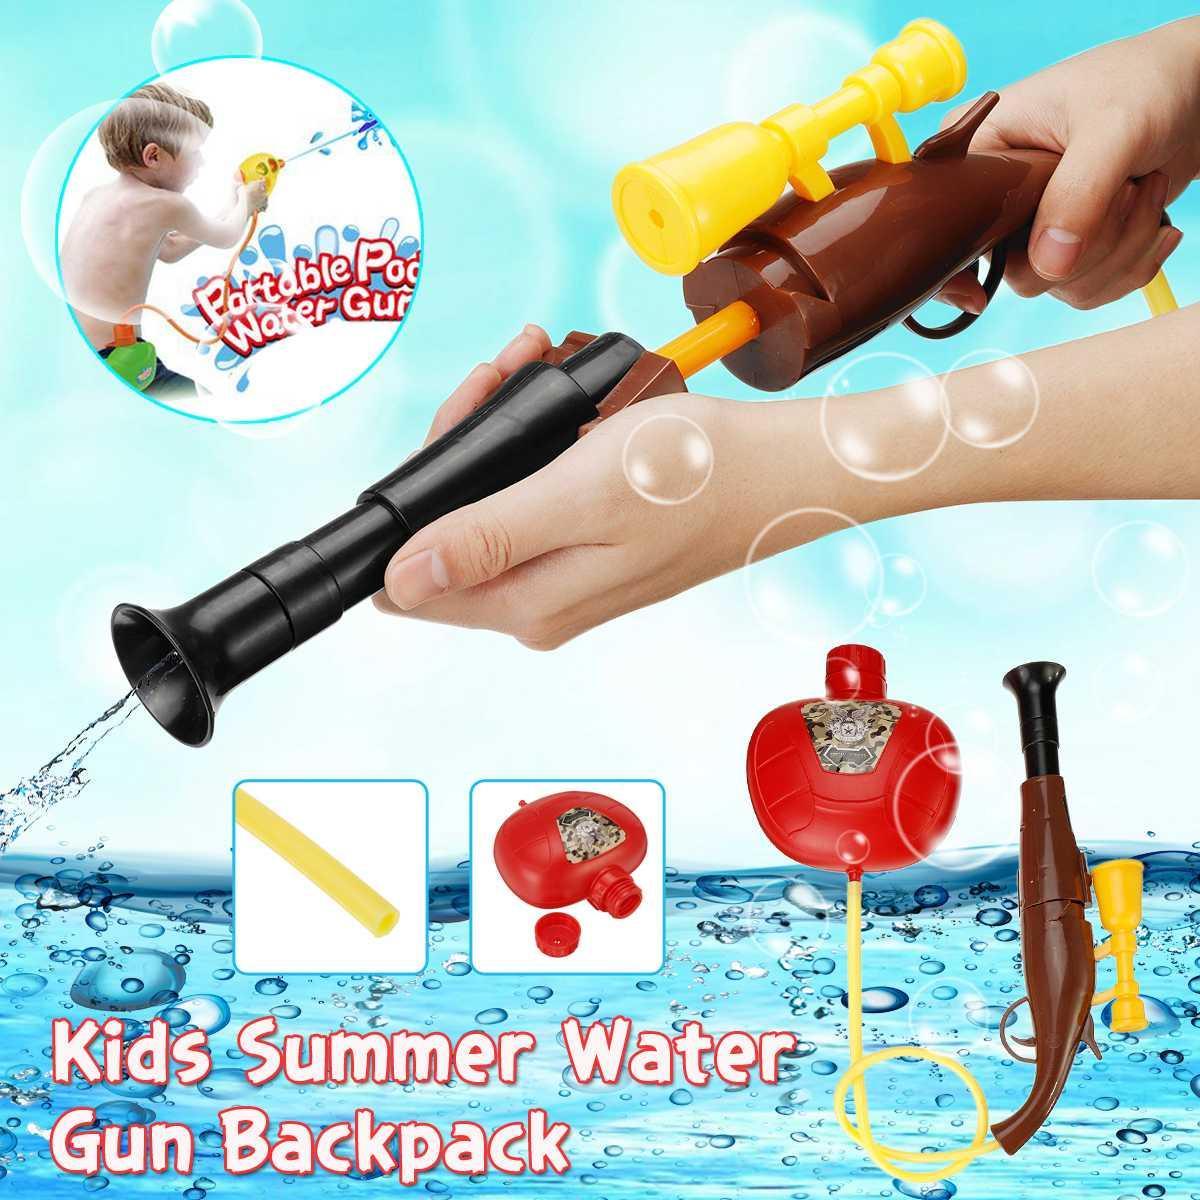 Big Tank Summer Water G Un Fireman Backpack Water G Un Large  Water Squirt For Beach Lake Swim Children Gift